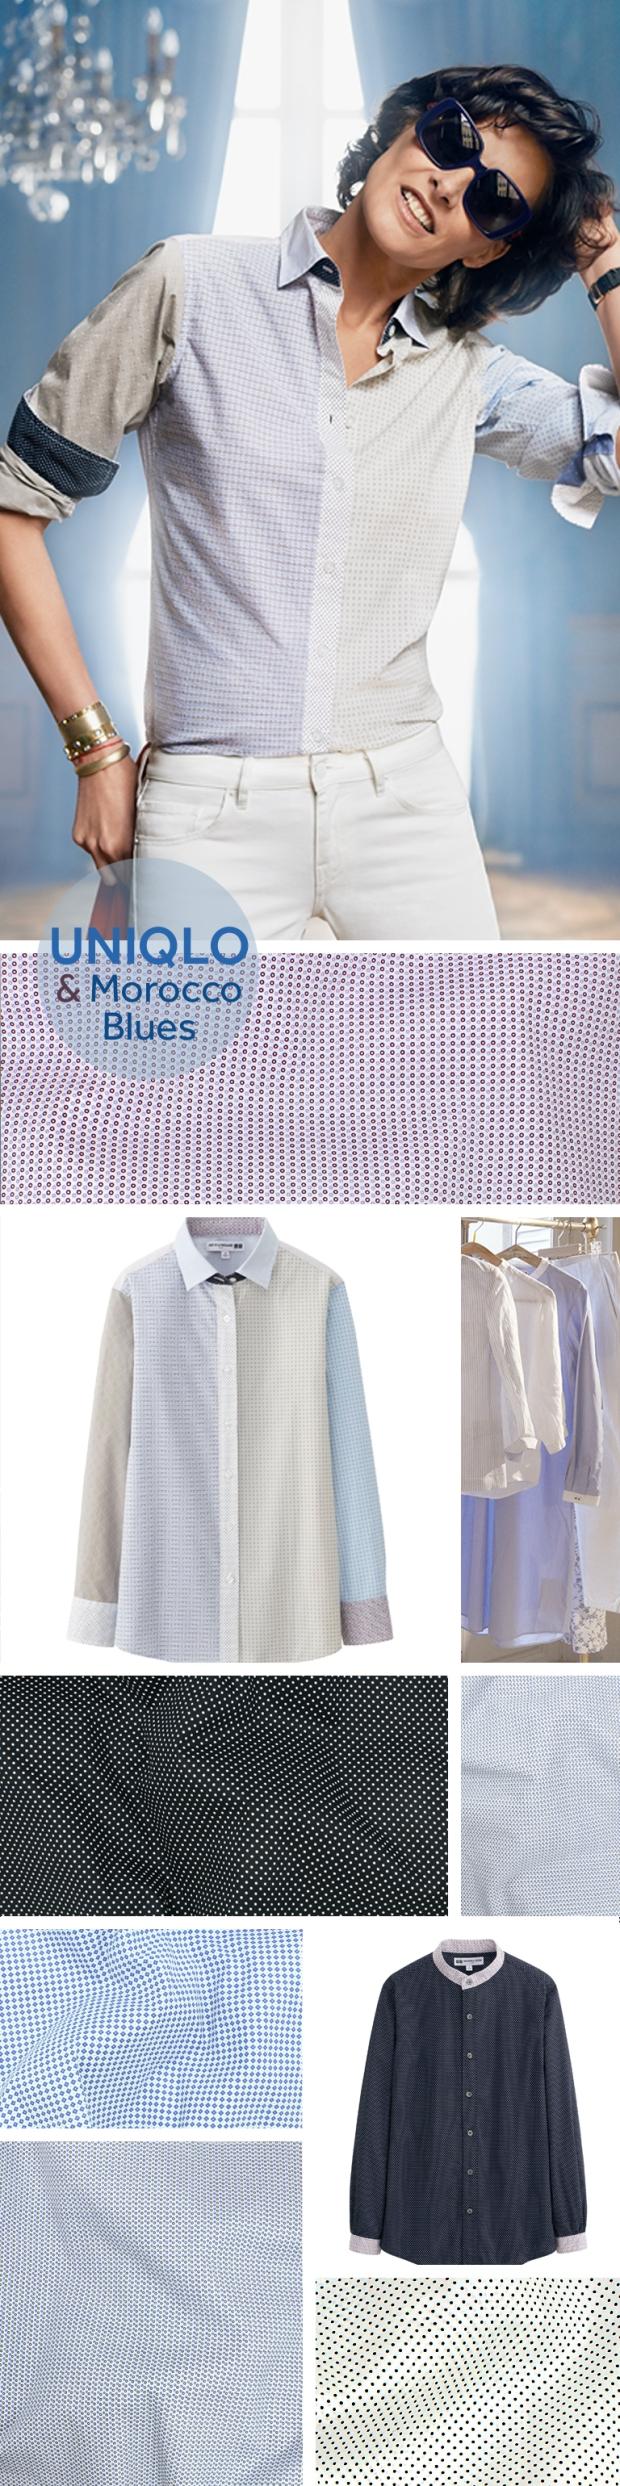 uniqlo_ines_de_la_fressange_poplin_shirt_patchwork_telio_mococco_blues_2